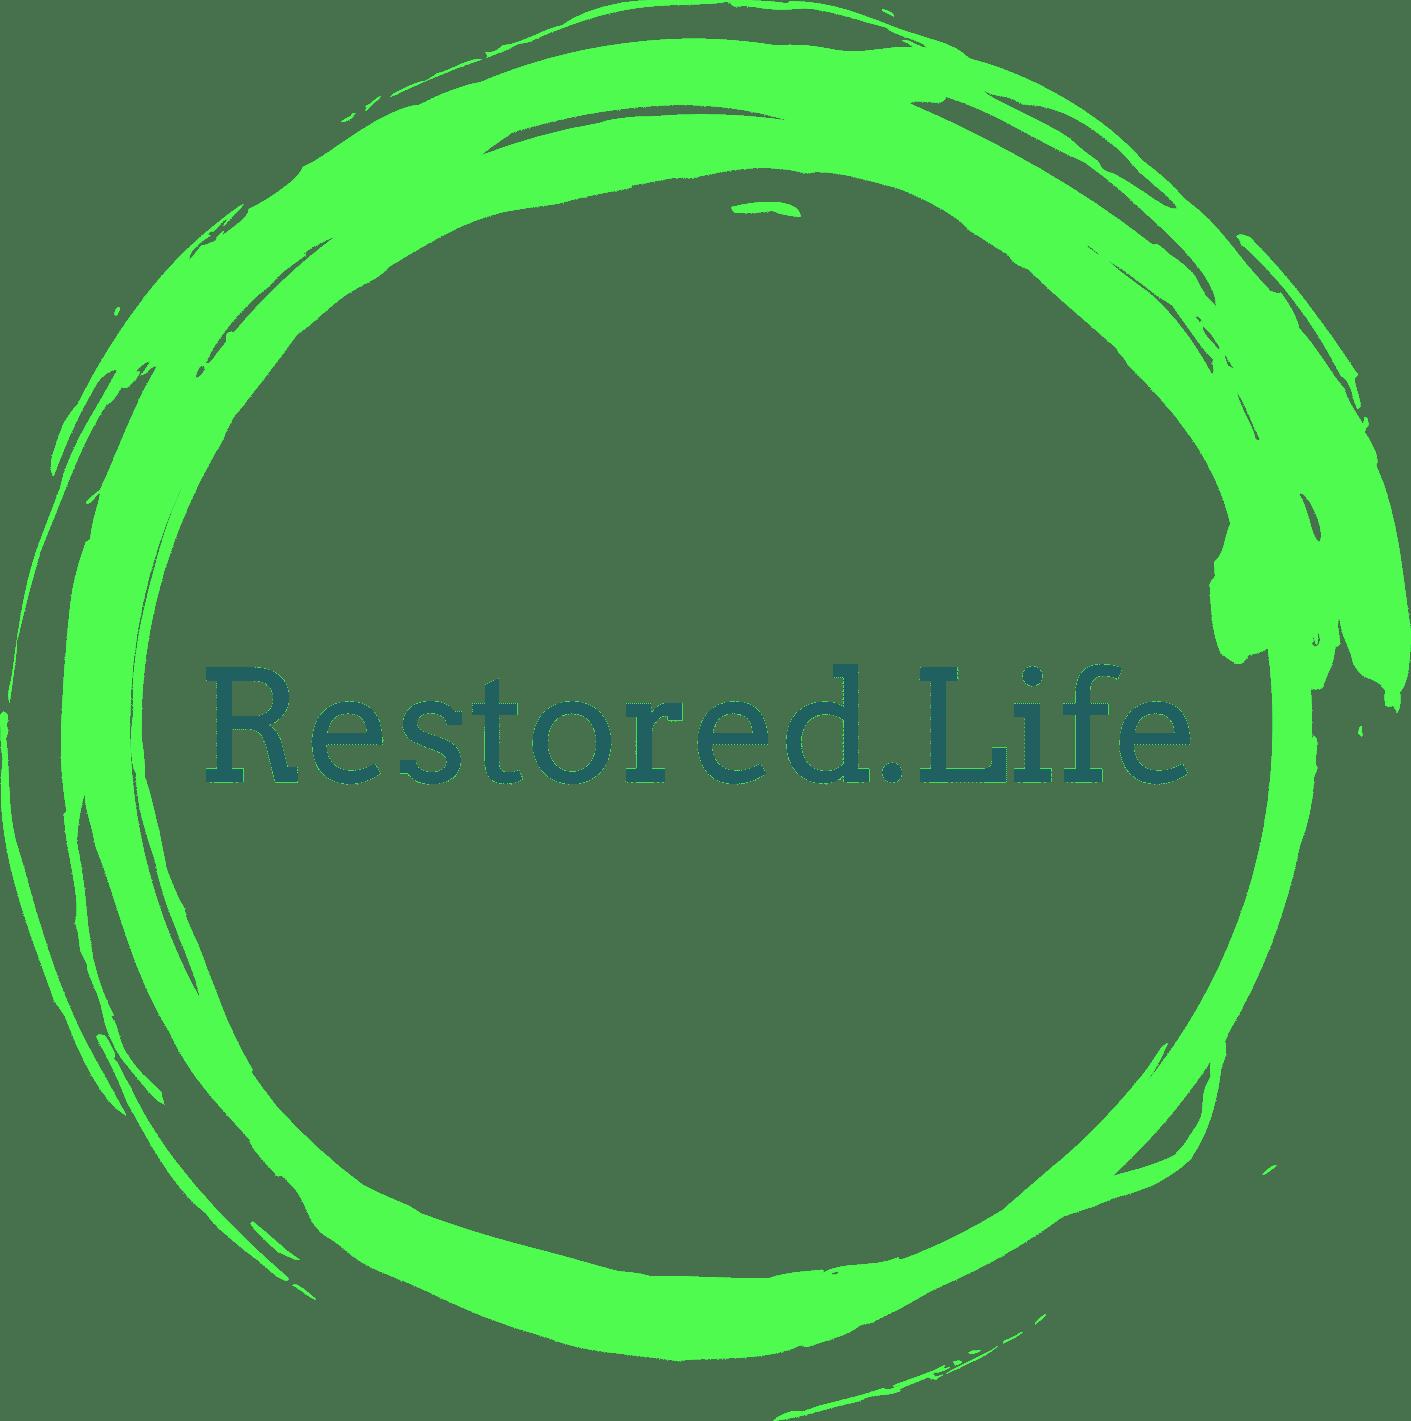 Restored Life